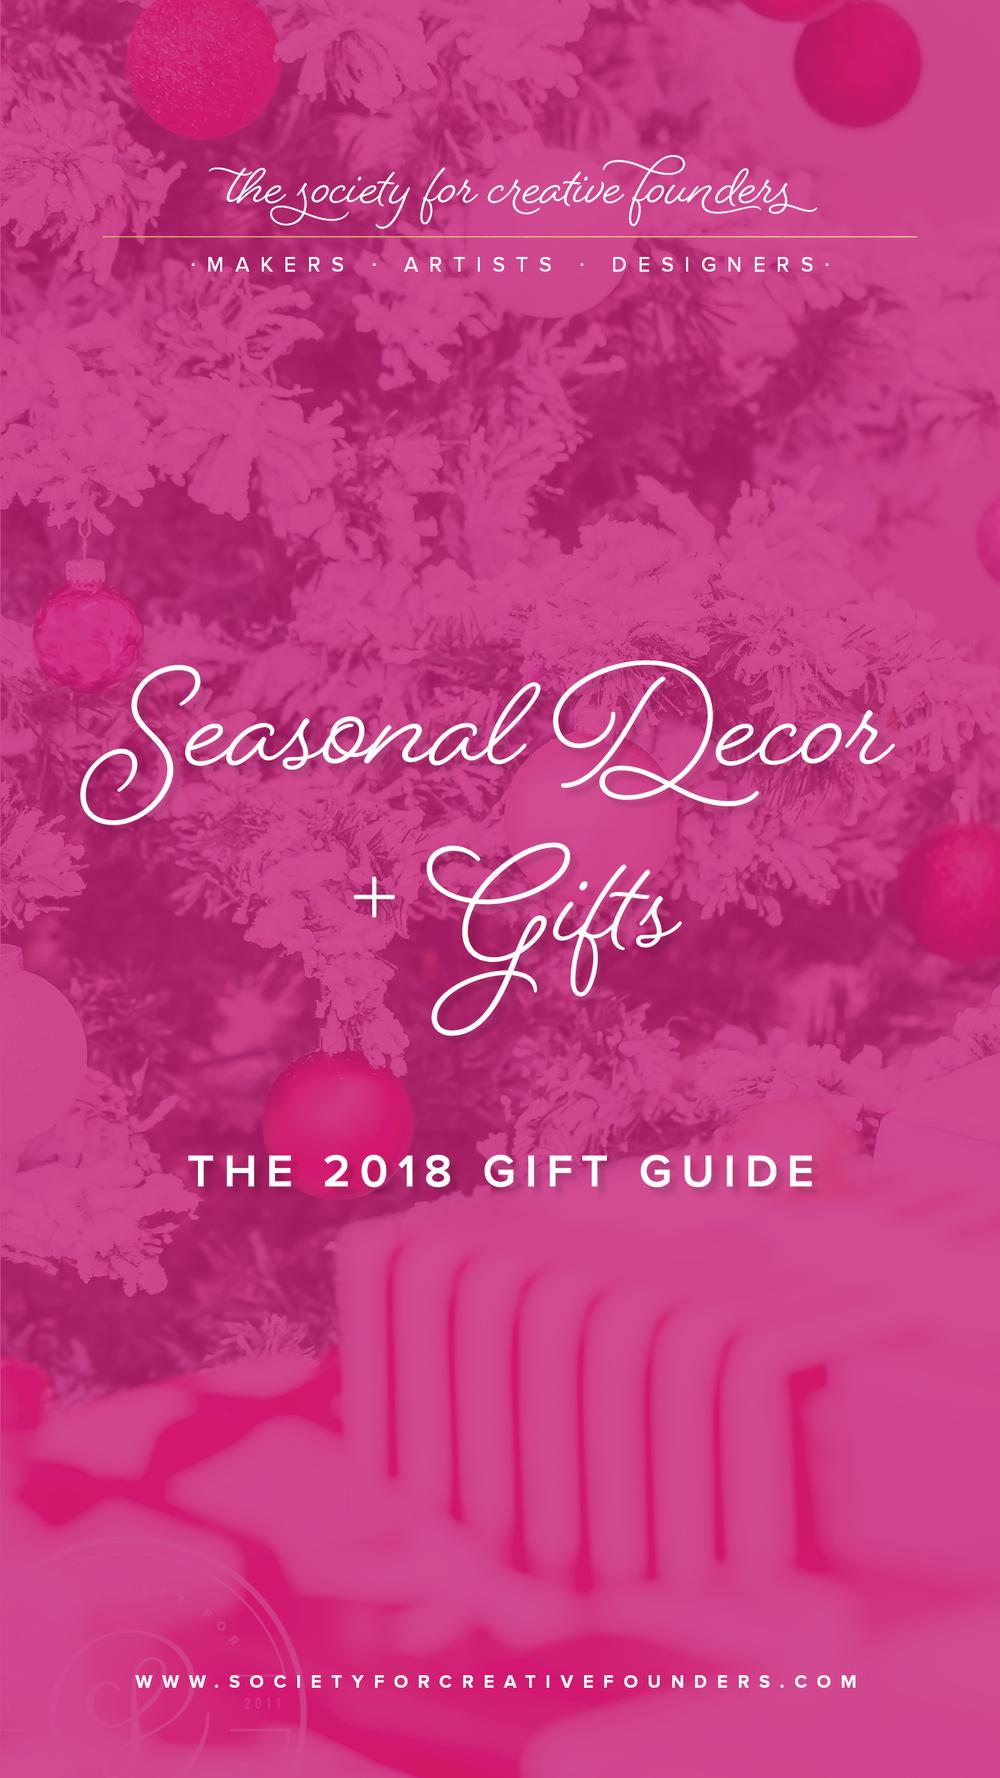 Seasonal Decor + Gifts - Creative Founders 2018 Gift Guide